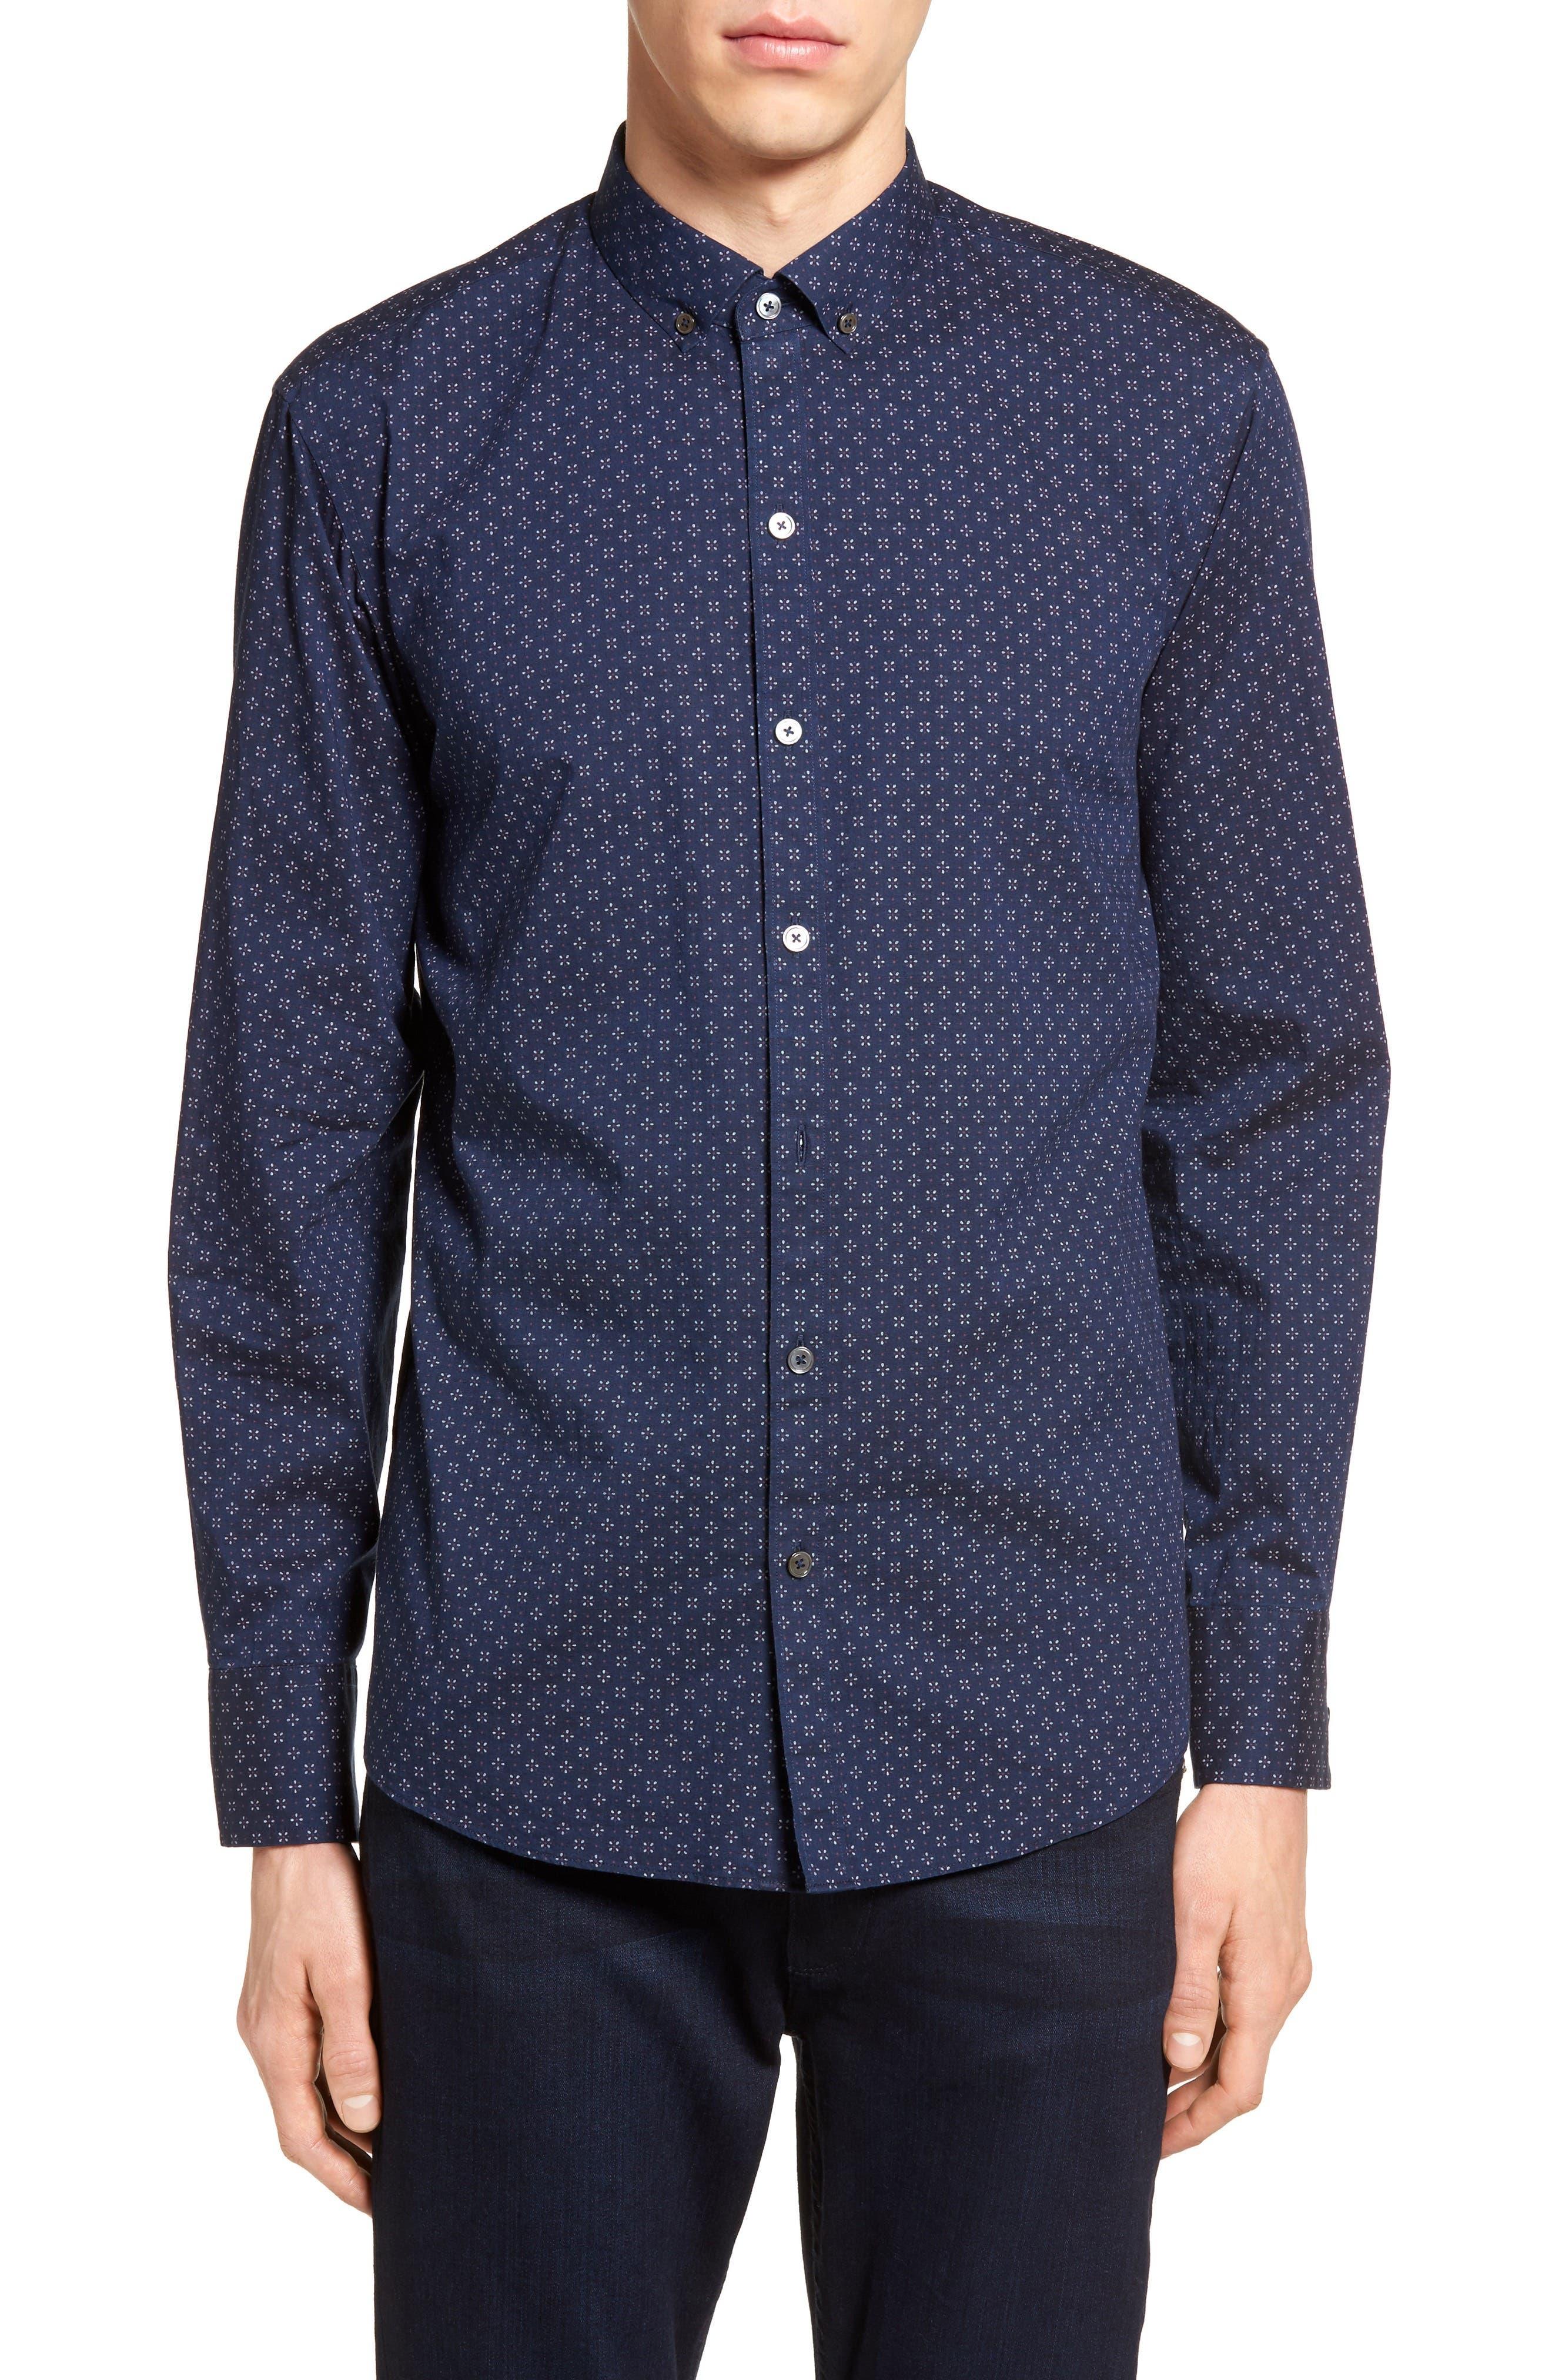 Alternate Image 1 Selected - Zachary Prell Kinnear Slim Fit Print Shirt